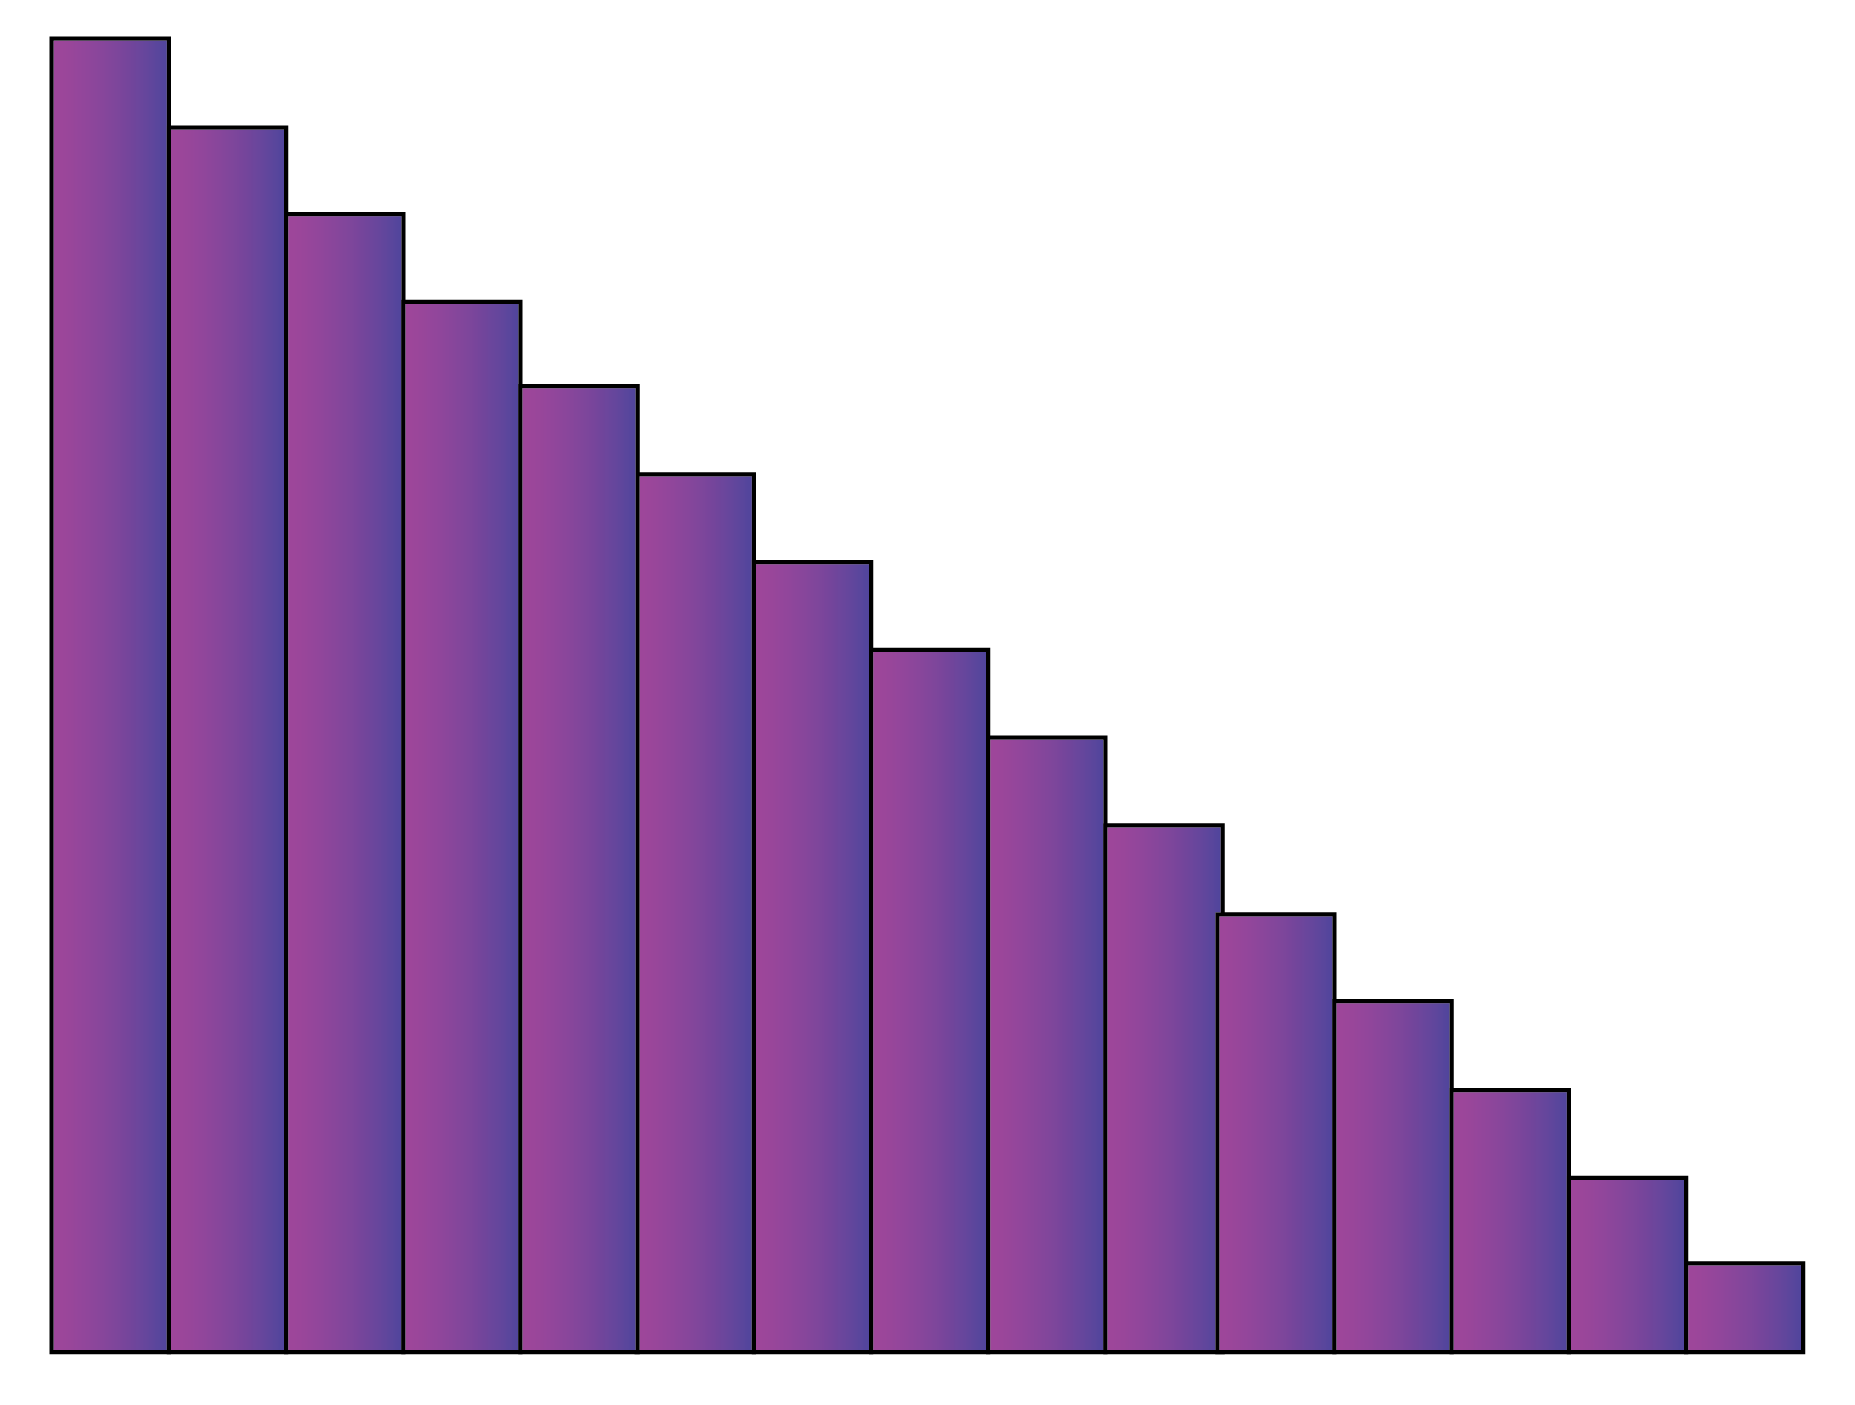 skewed right histogram shape